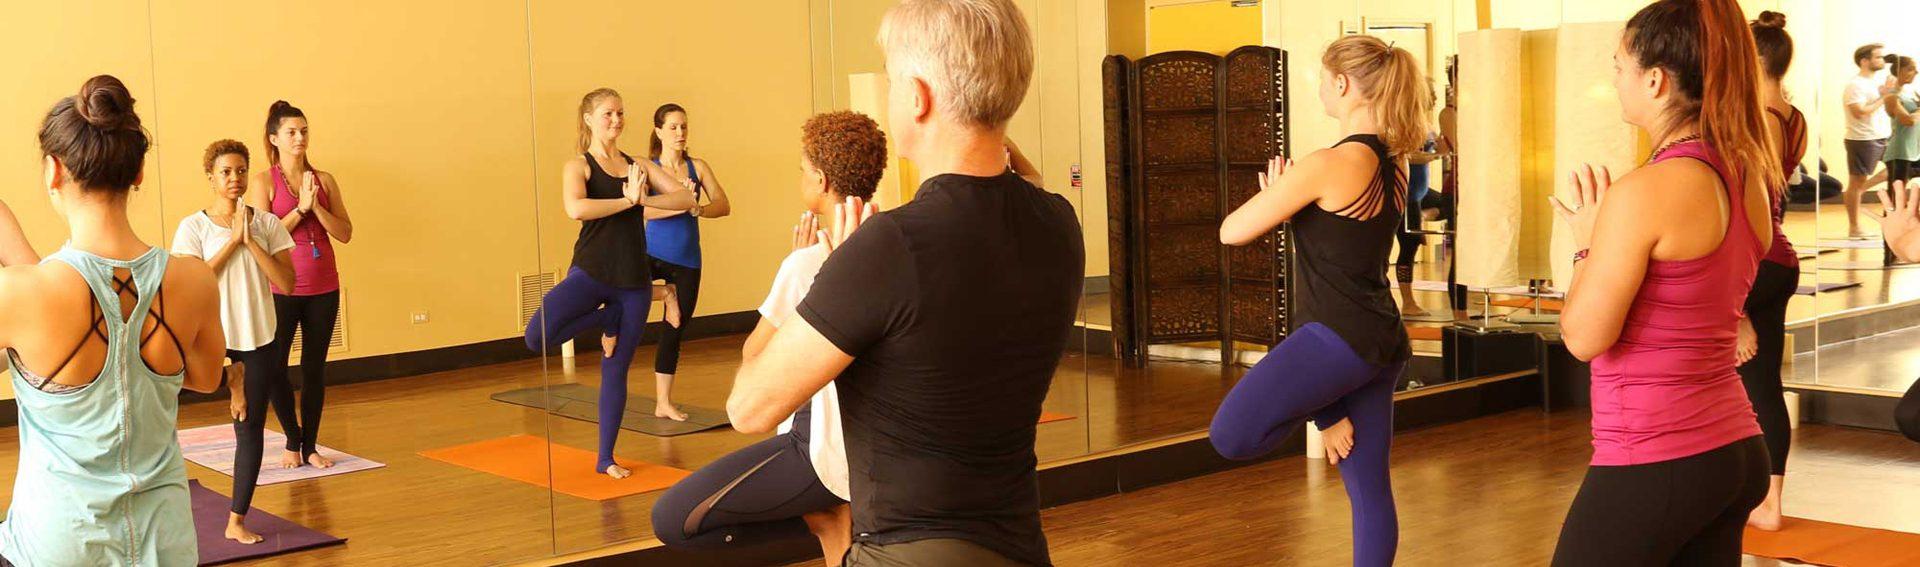 Yoga class, advanced pose involving balancing on one leg